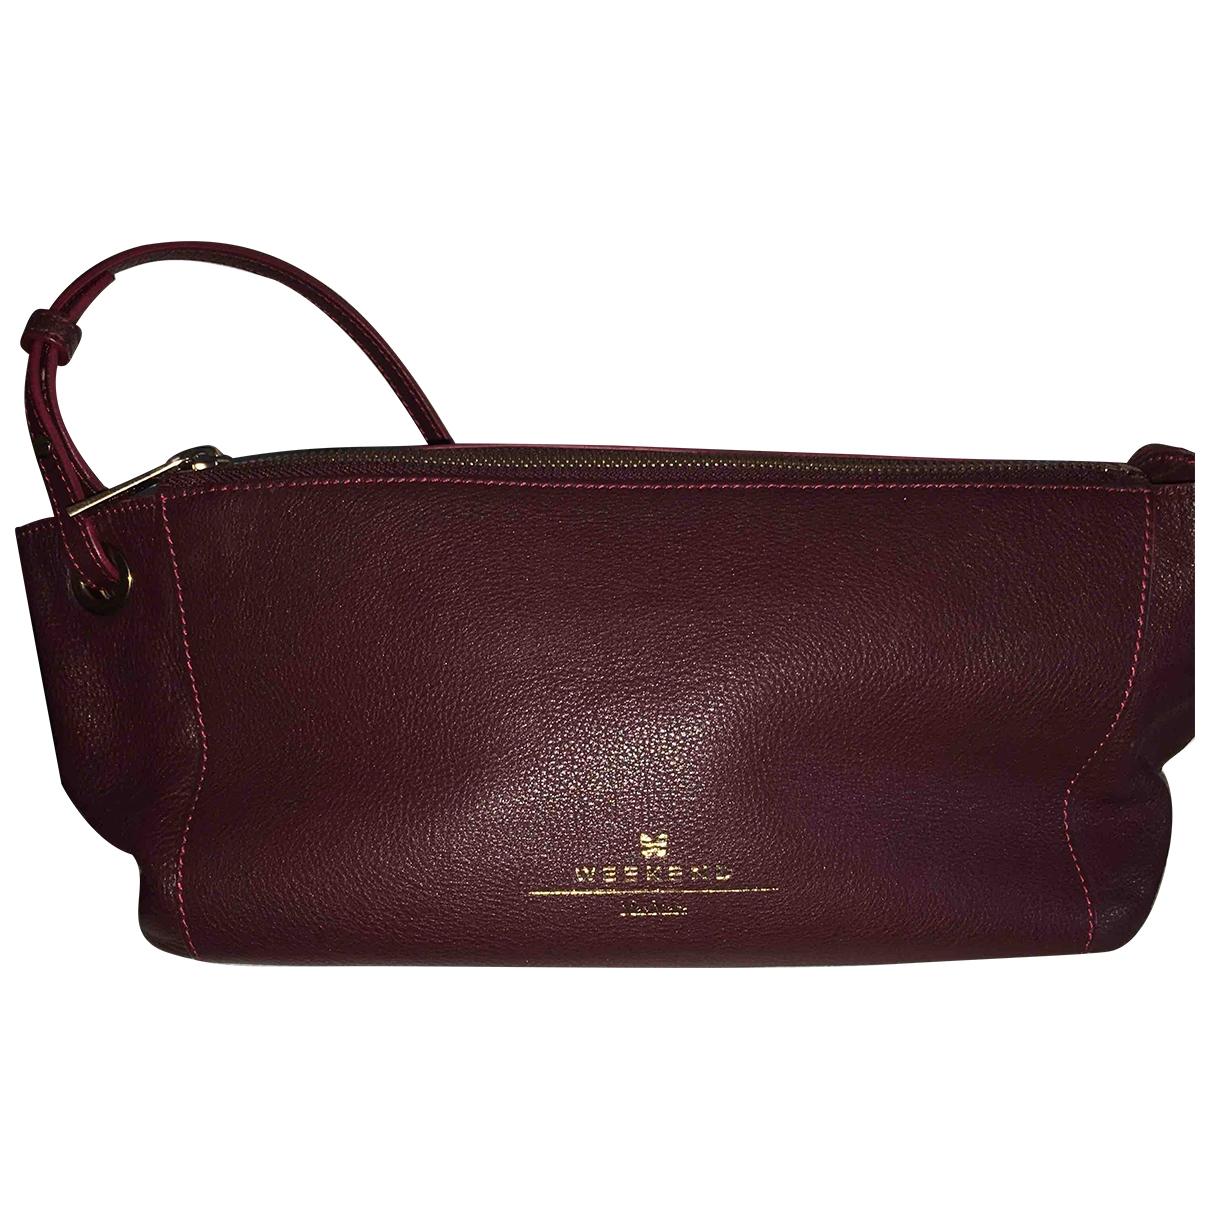 Max Mara \N Burgundy Leather handbag for Women \N